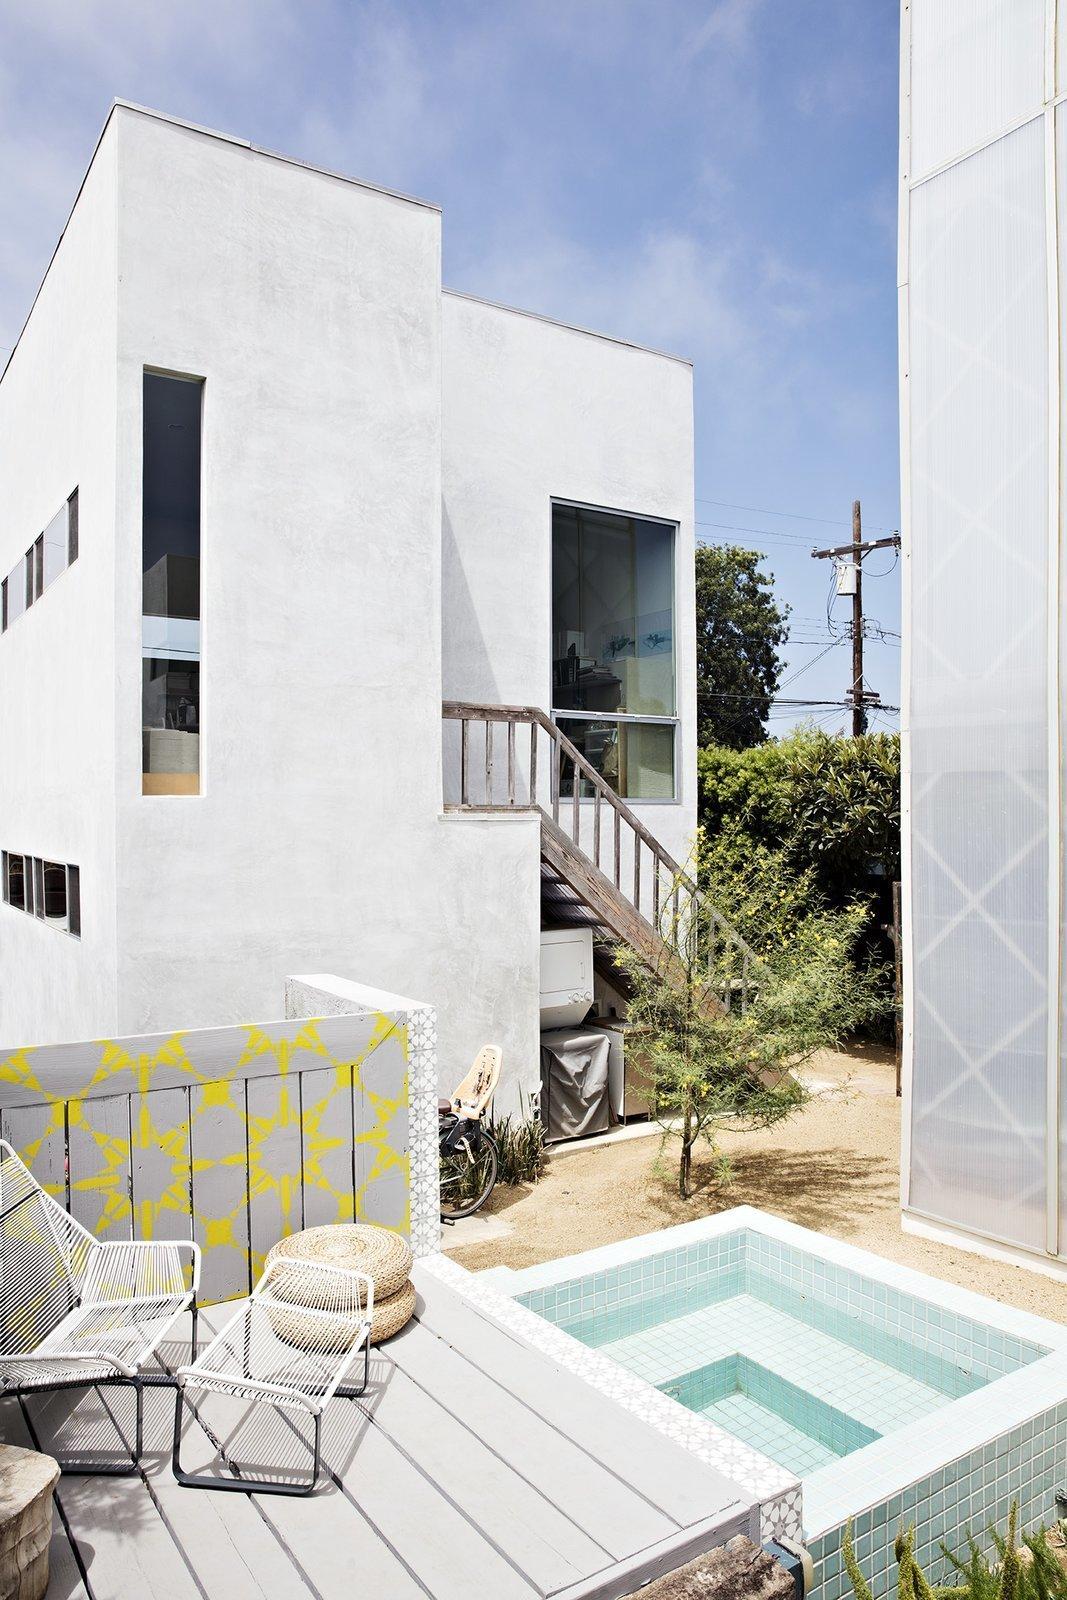 10 Best Modern Homes in Venice Beach, California - Dwell